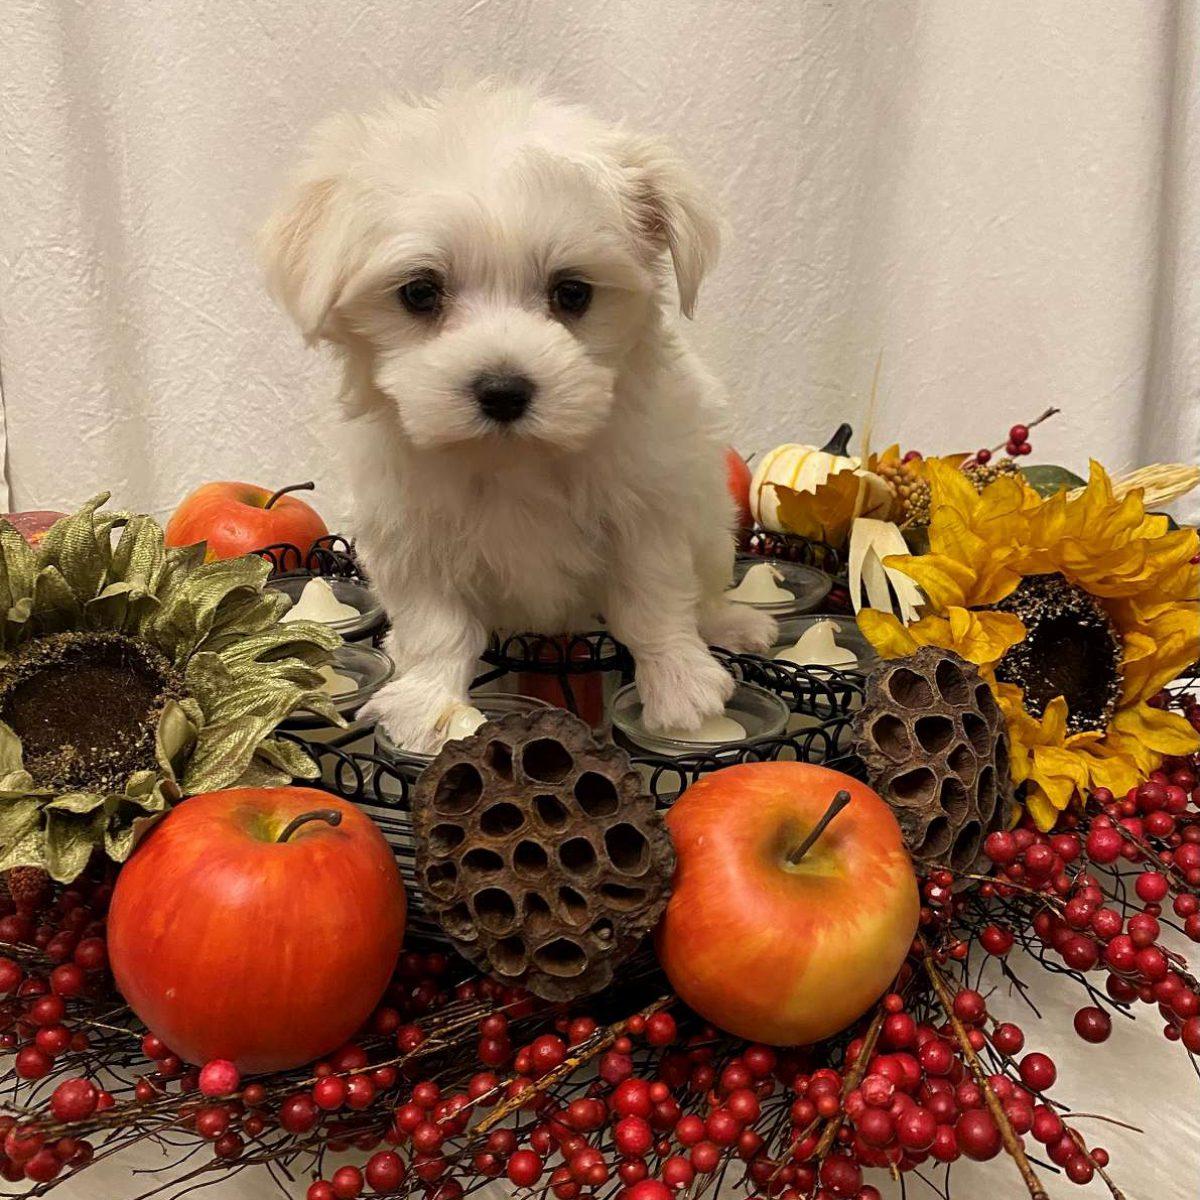 Tundra - Maltese puppies for Sale In Arkansas